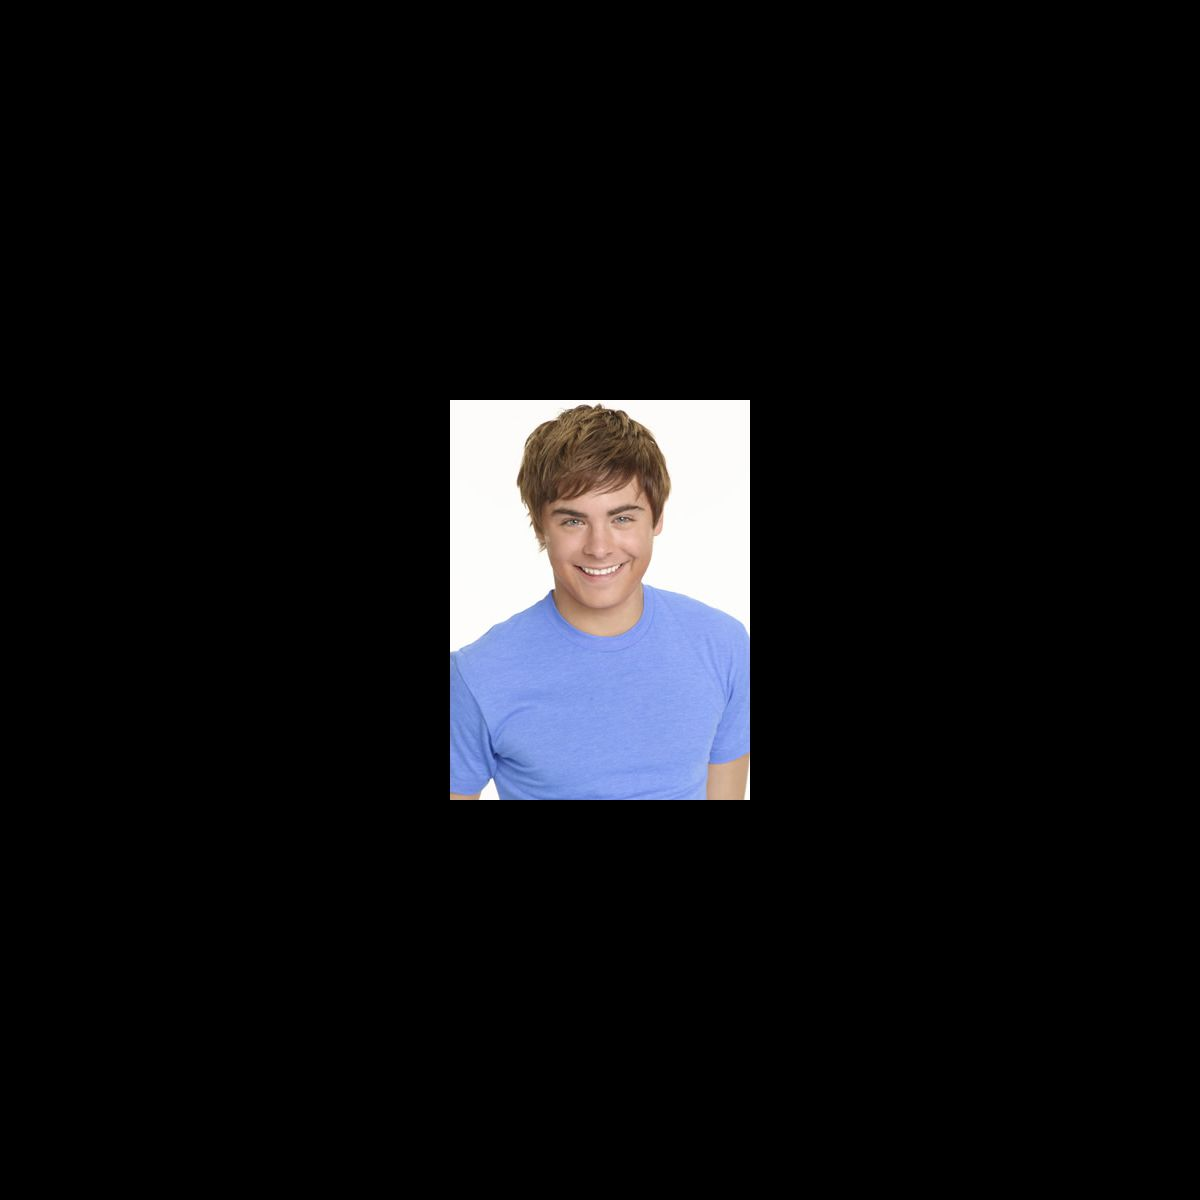 High School Musical 2 : Zac Efron - photo - Puremedias Zac Efron